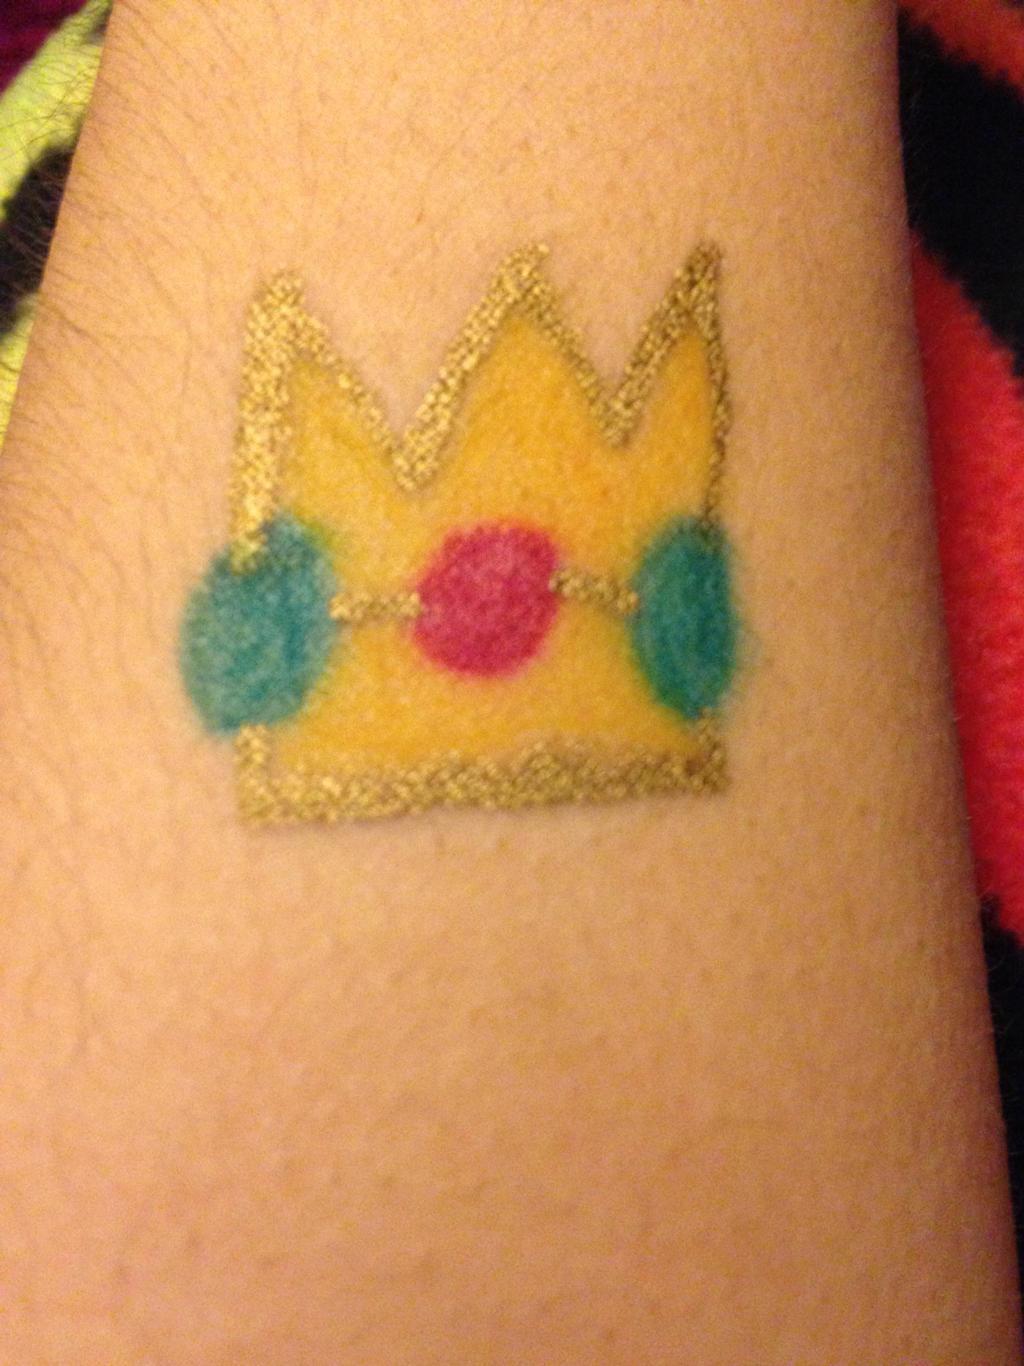 Princess Peach S Crown Sharpie Tattoo By Prince5s On Deviantart